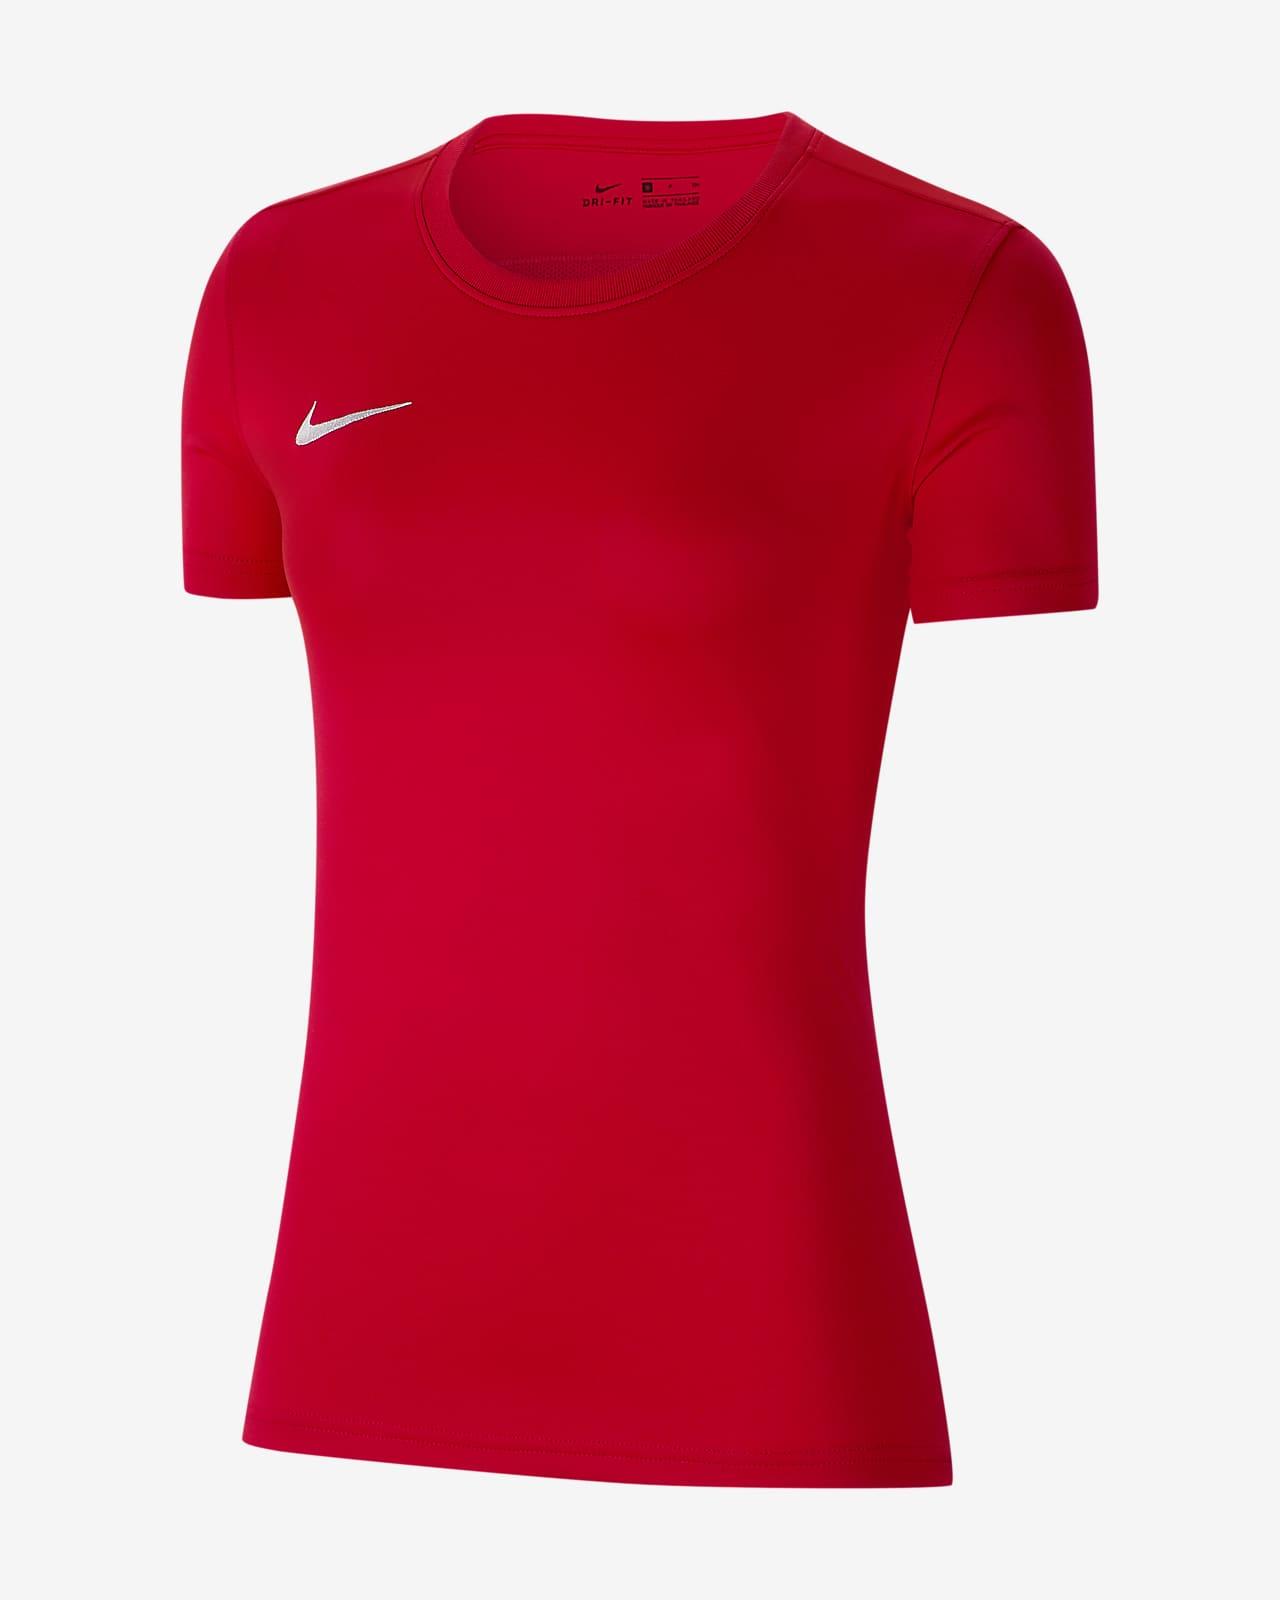 Nike Dri-FIT Park 7 Women's Football Shirt